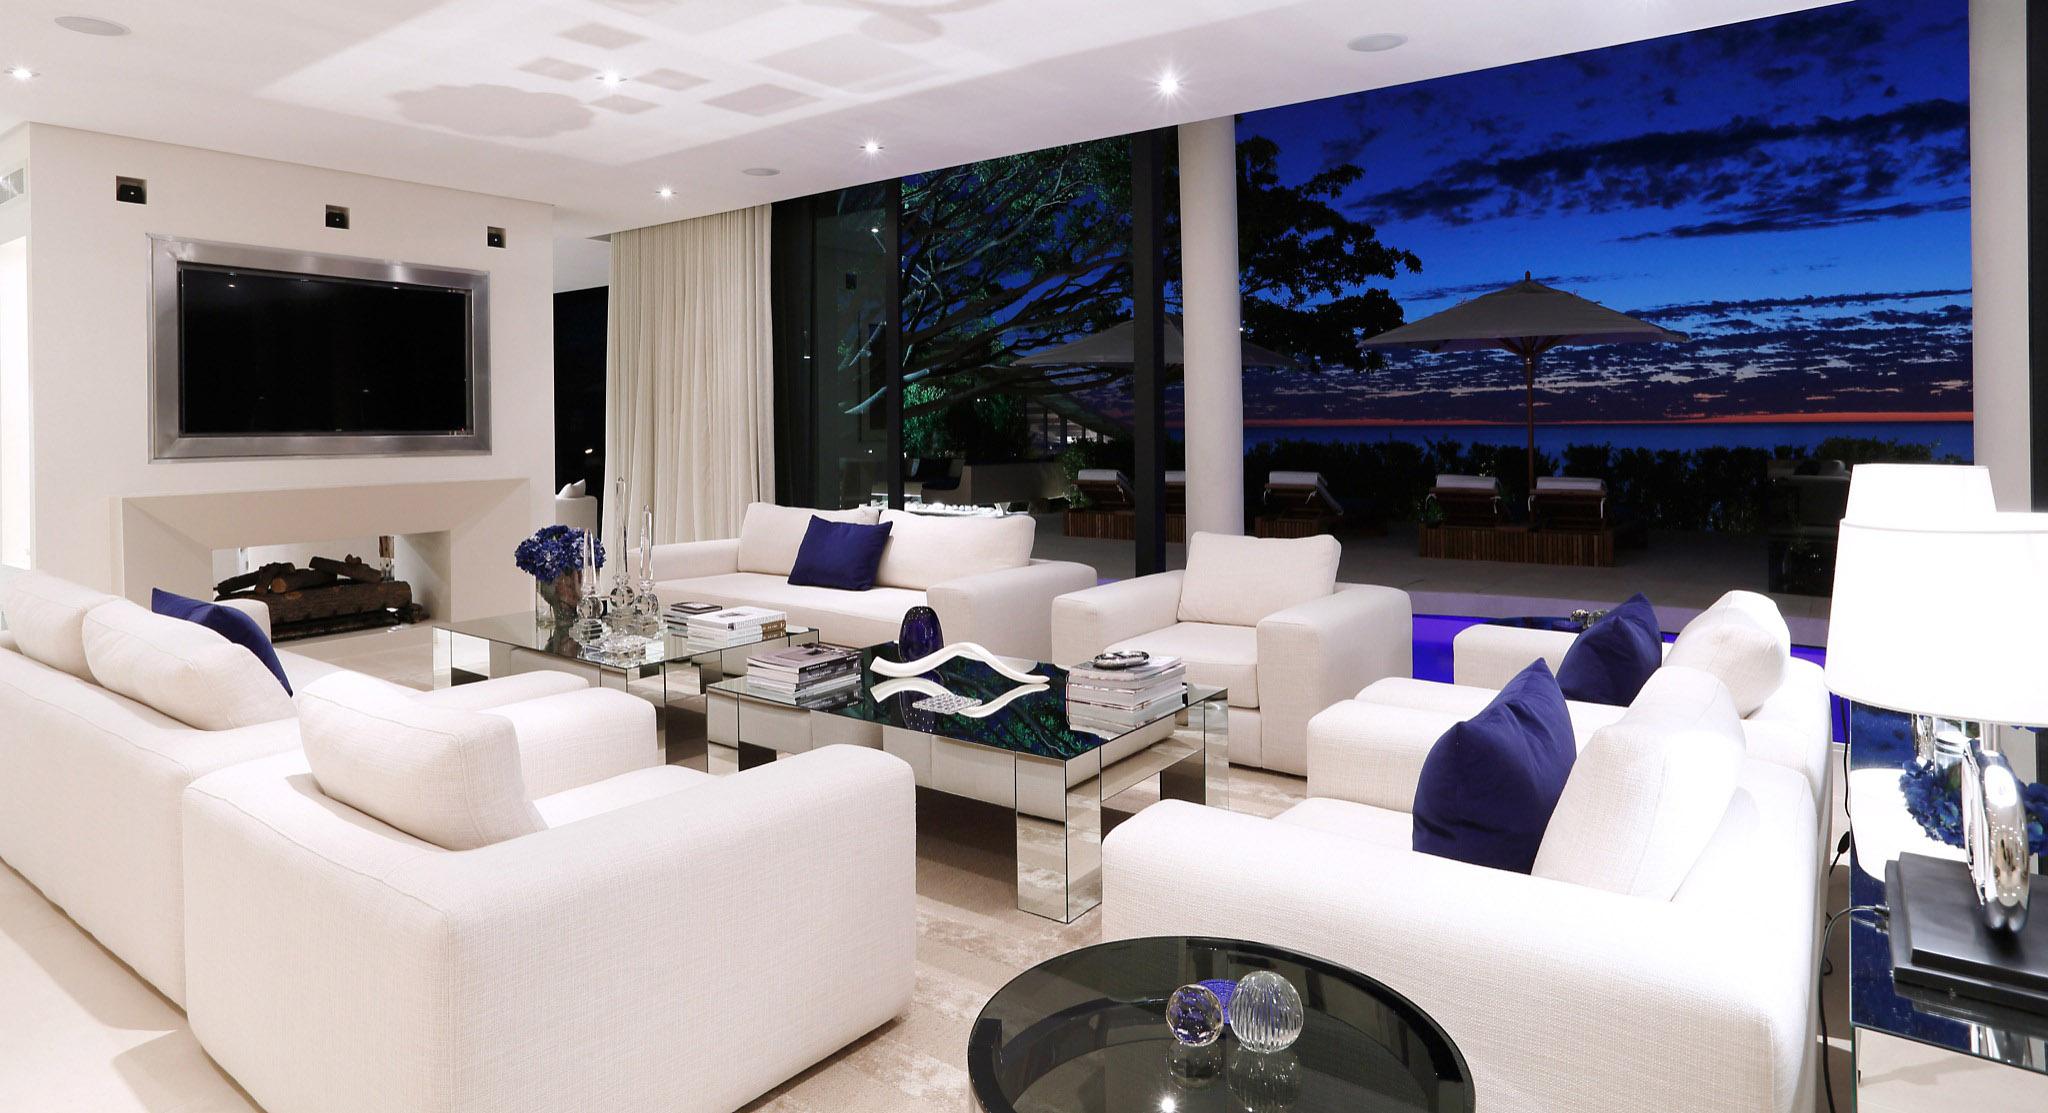 03 Lounge-5 2048.jpg